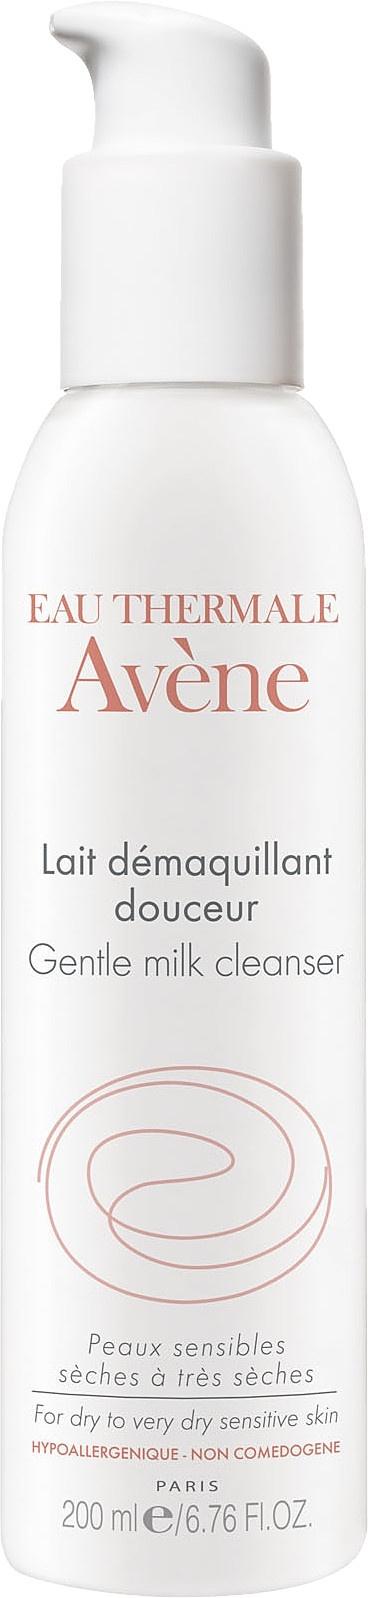 Avene Gentle Milk Cleanser 200ml